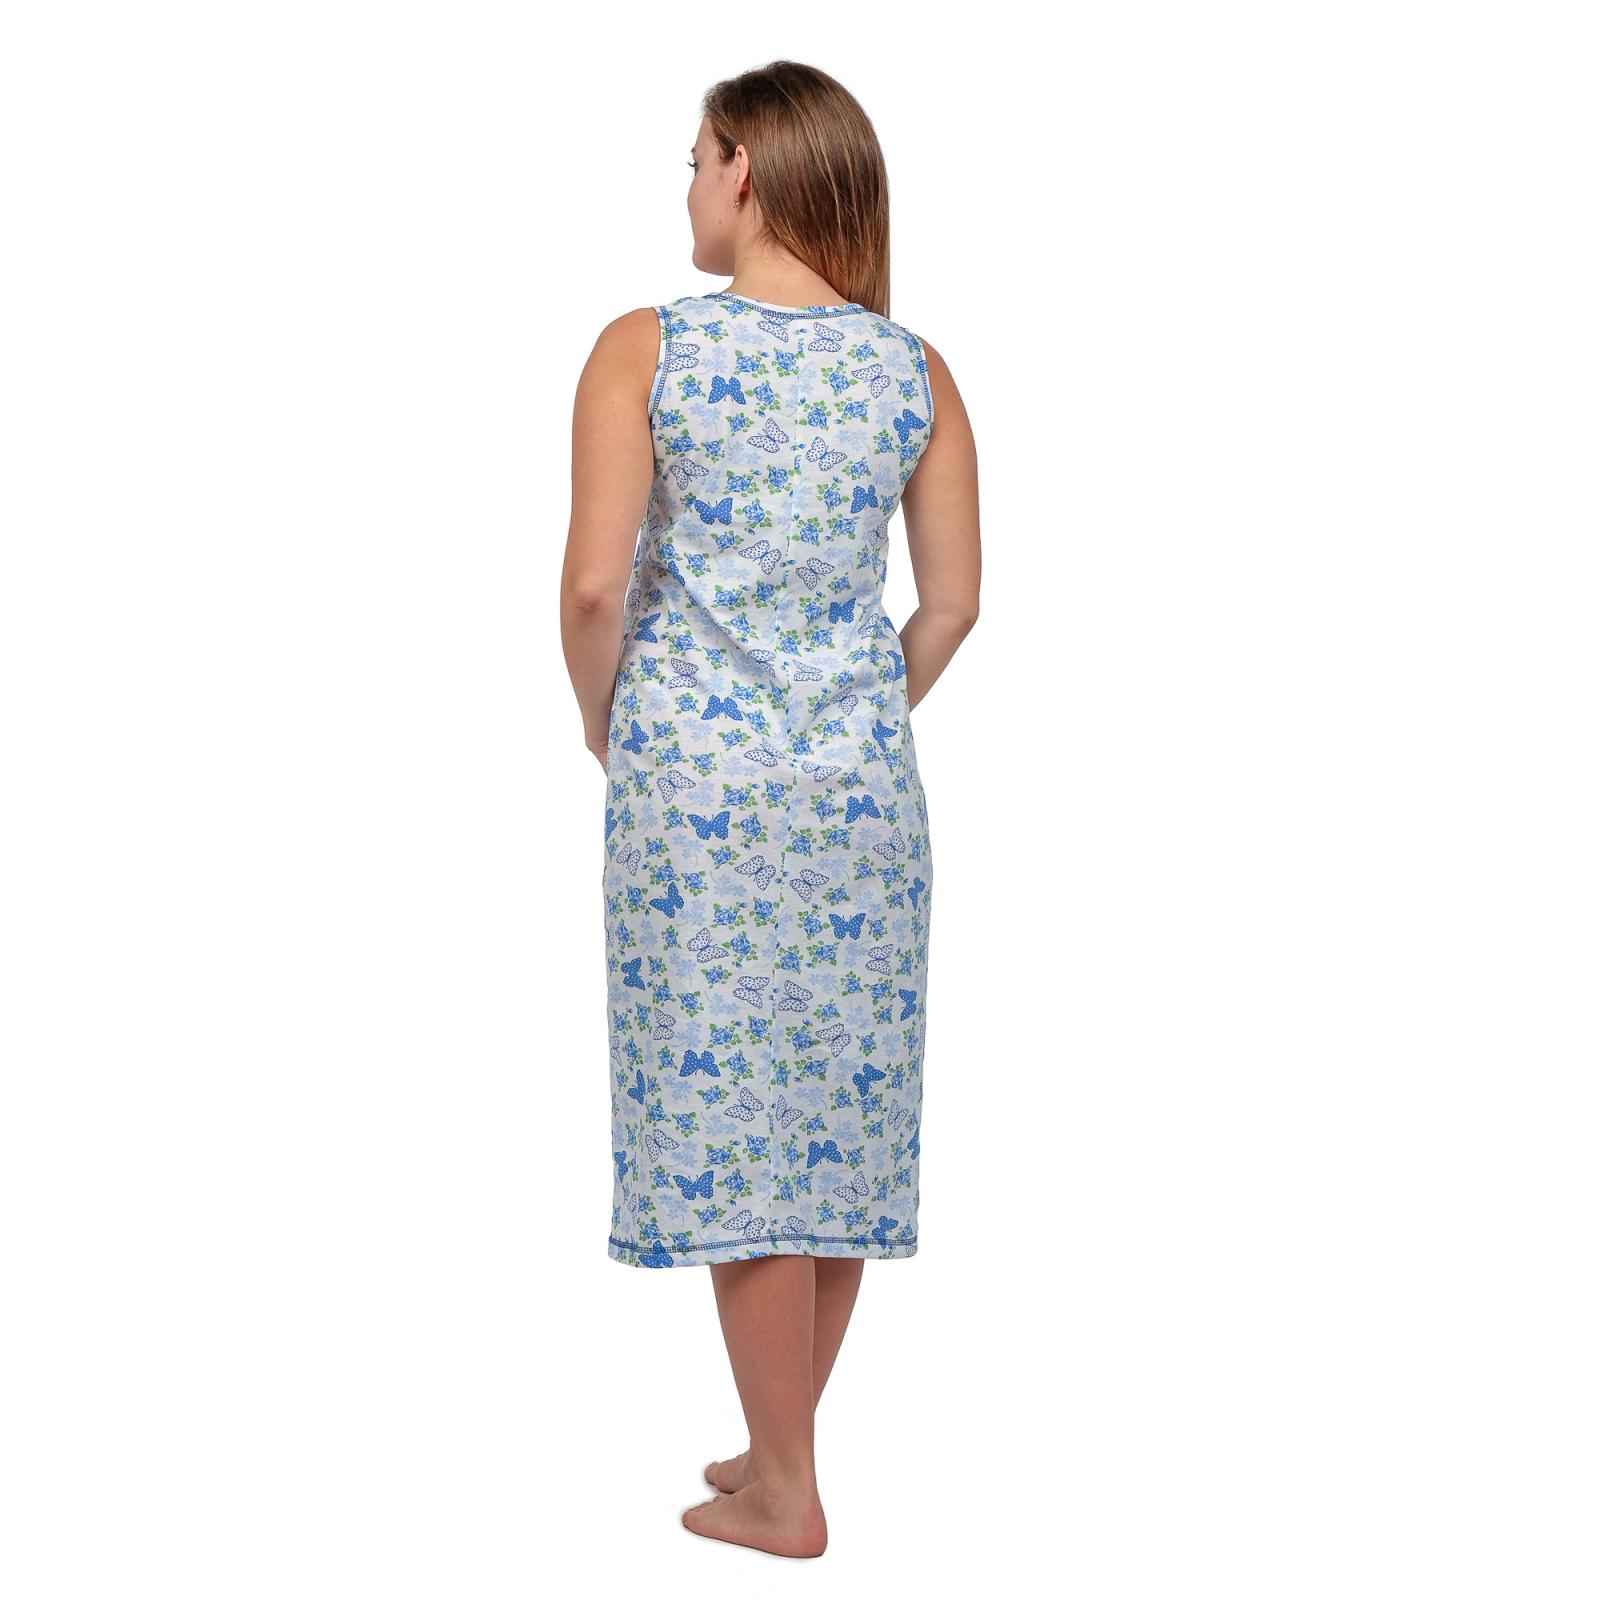 Ночная сорочка (бабушкина) Голубые бабочки М-0042Г